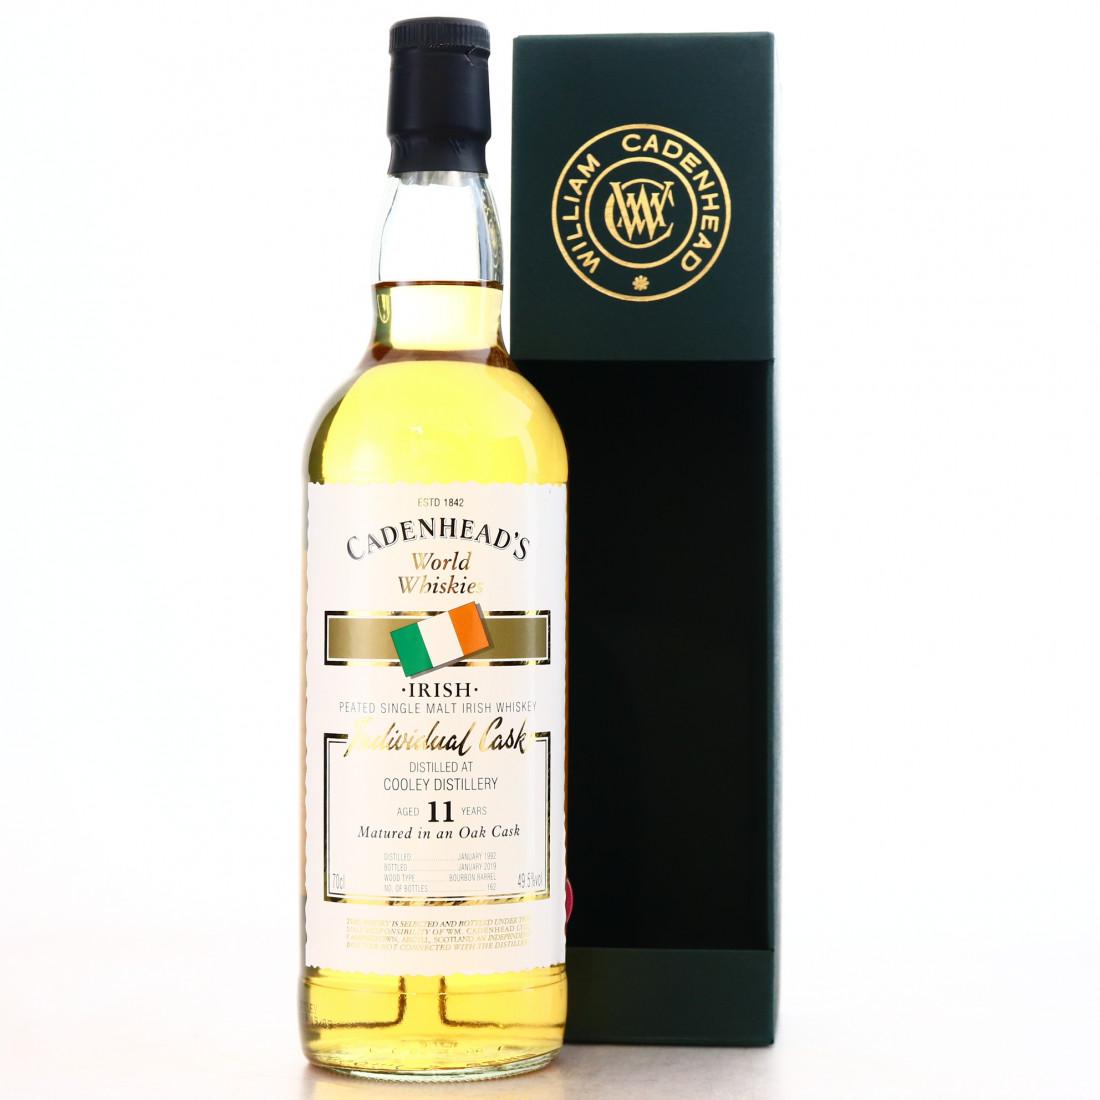 Cooley 1992 Cadenhead's 11 Year Old World Whiskies